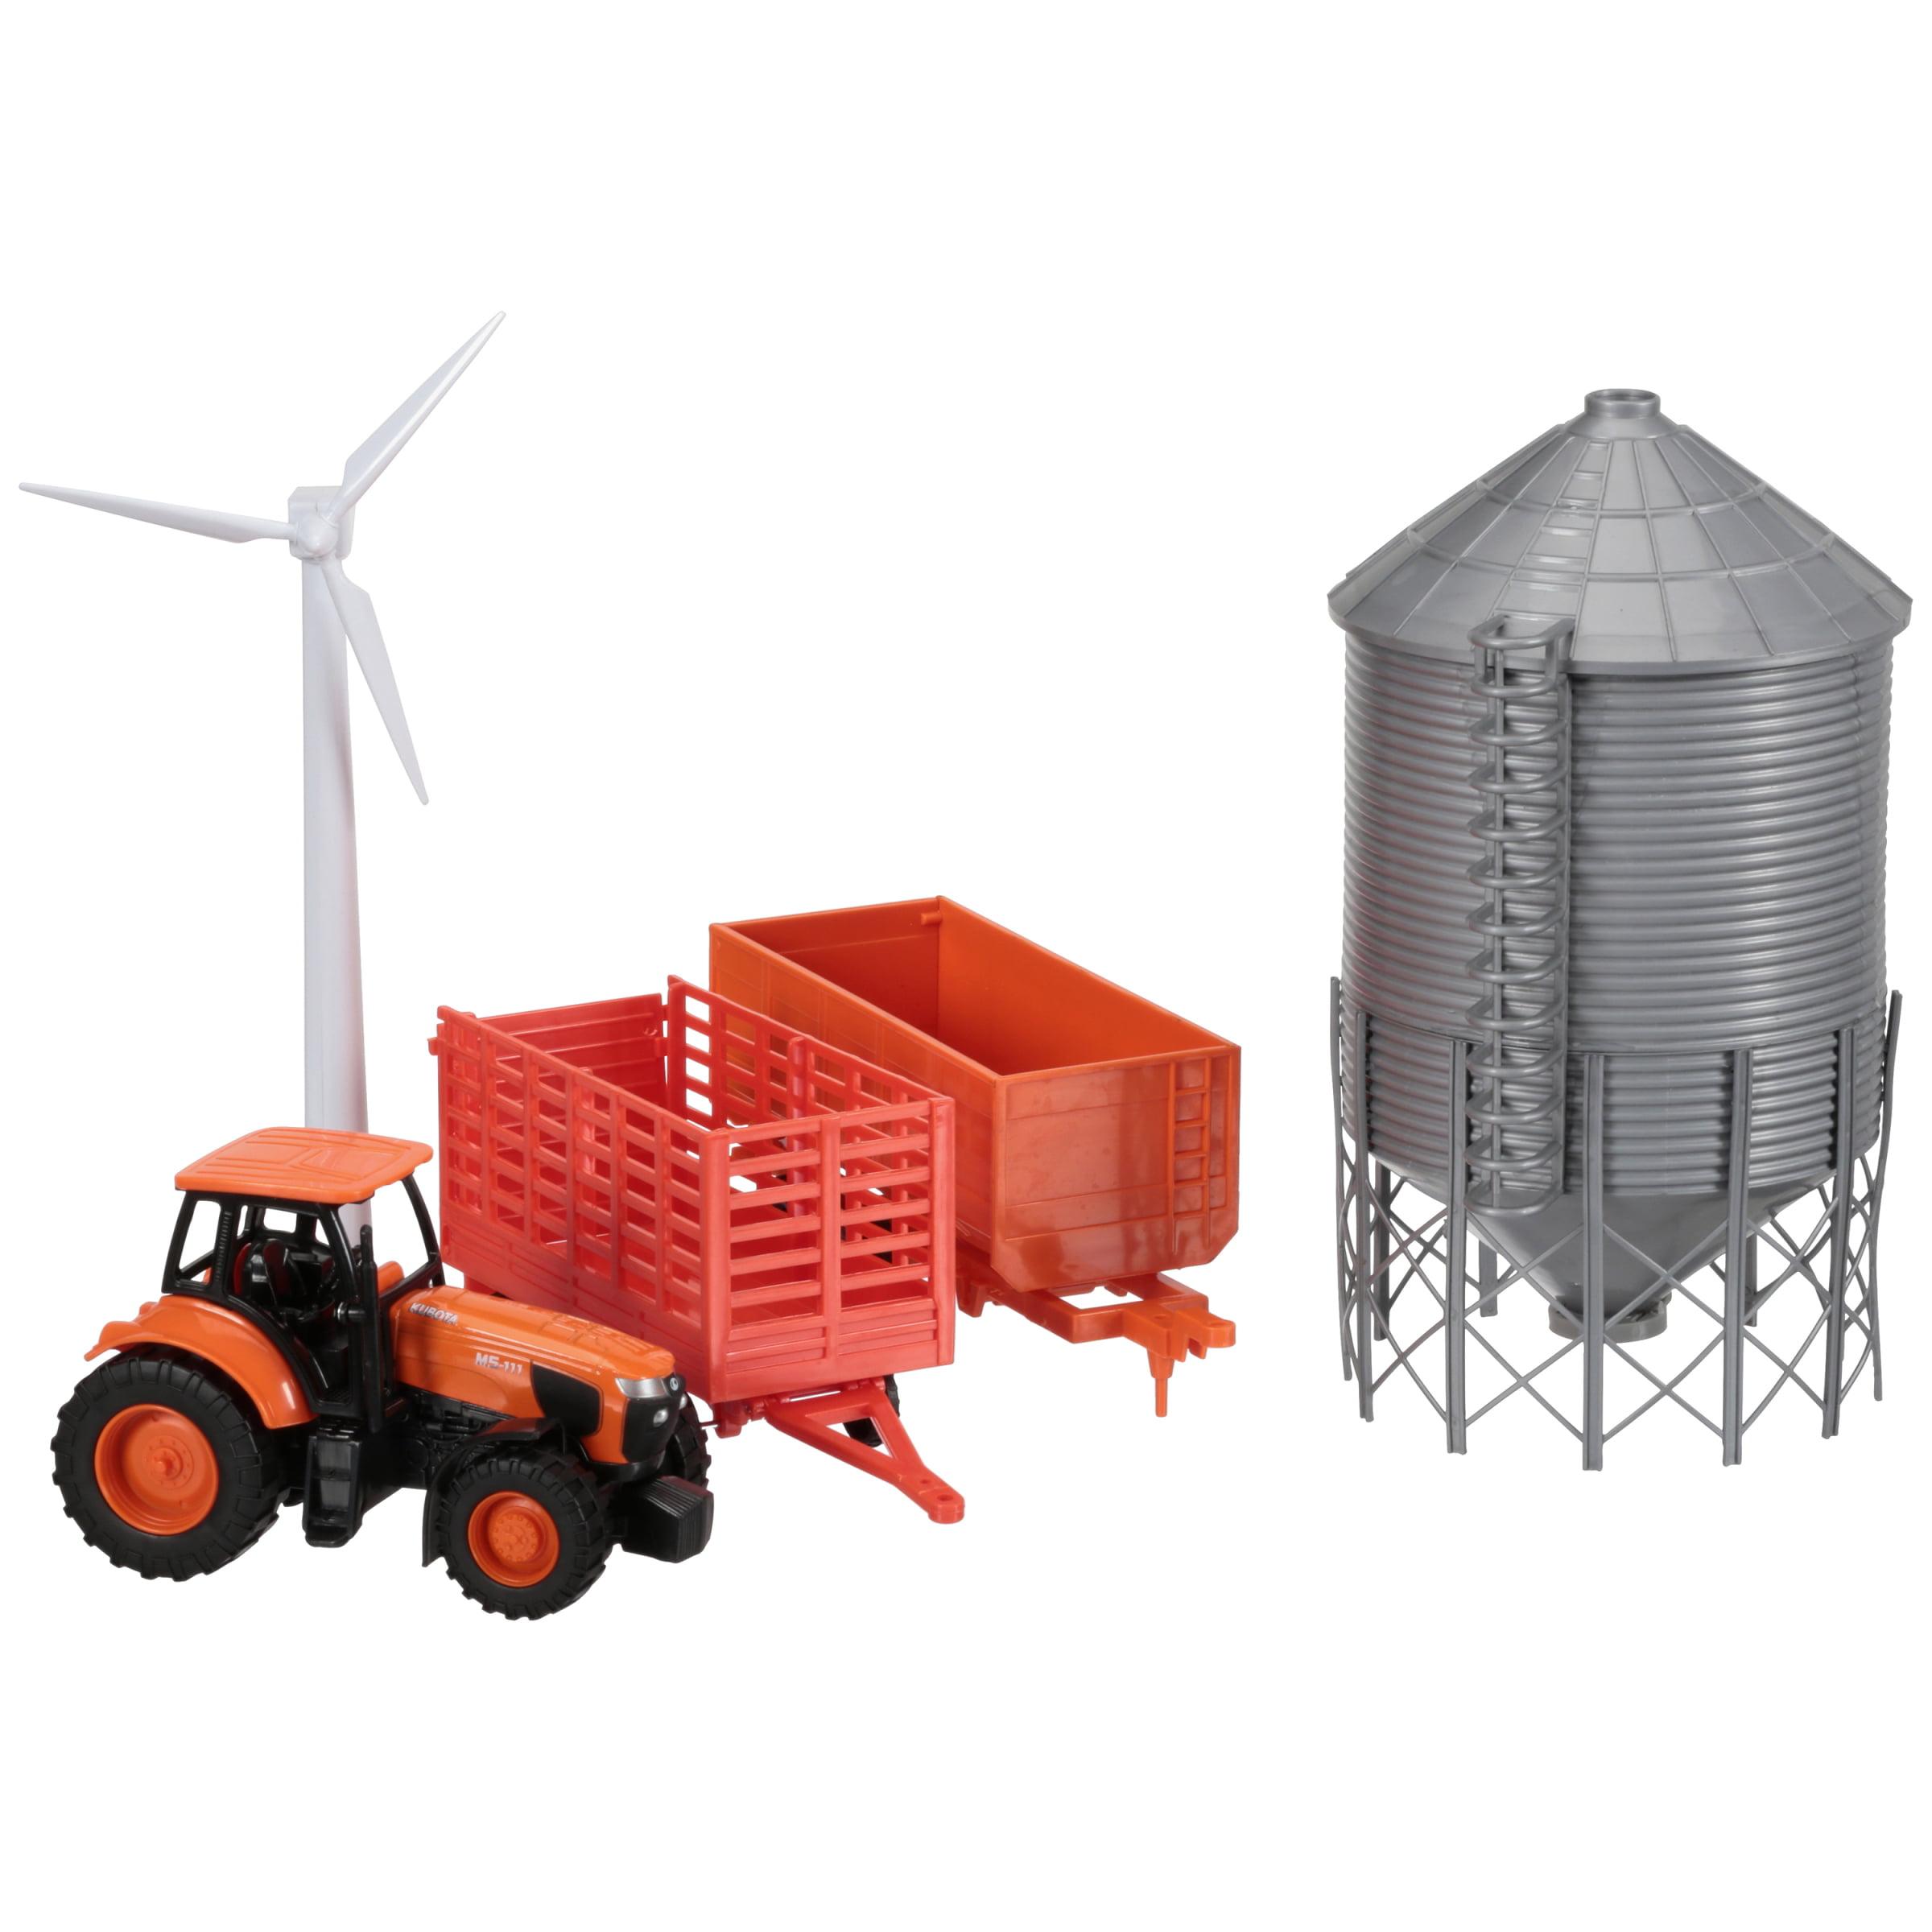 Kubota M5-111 Tractor with Wagons & Grain Bin Toy Set 6 pc Box by Kubota Tractor Corporation